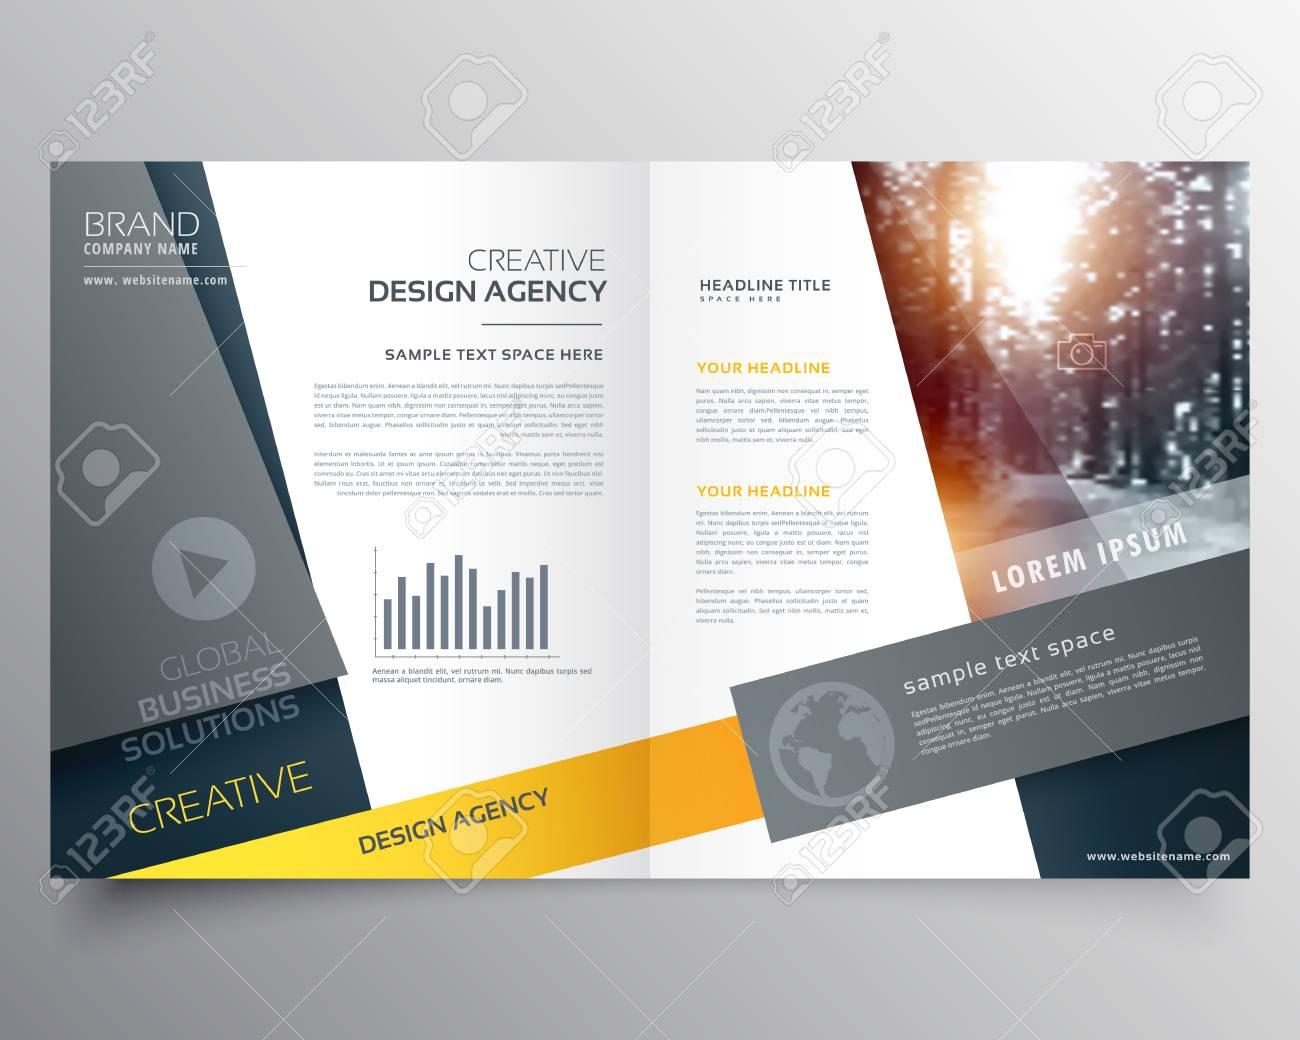 A Modern Bi Fold Brochure Design Template Or Magazine Cover Page